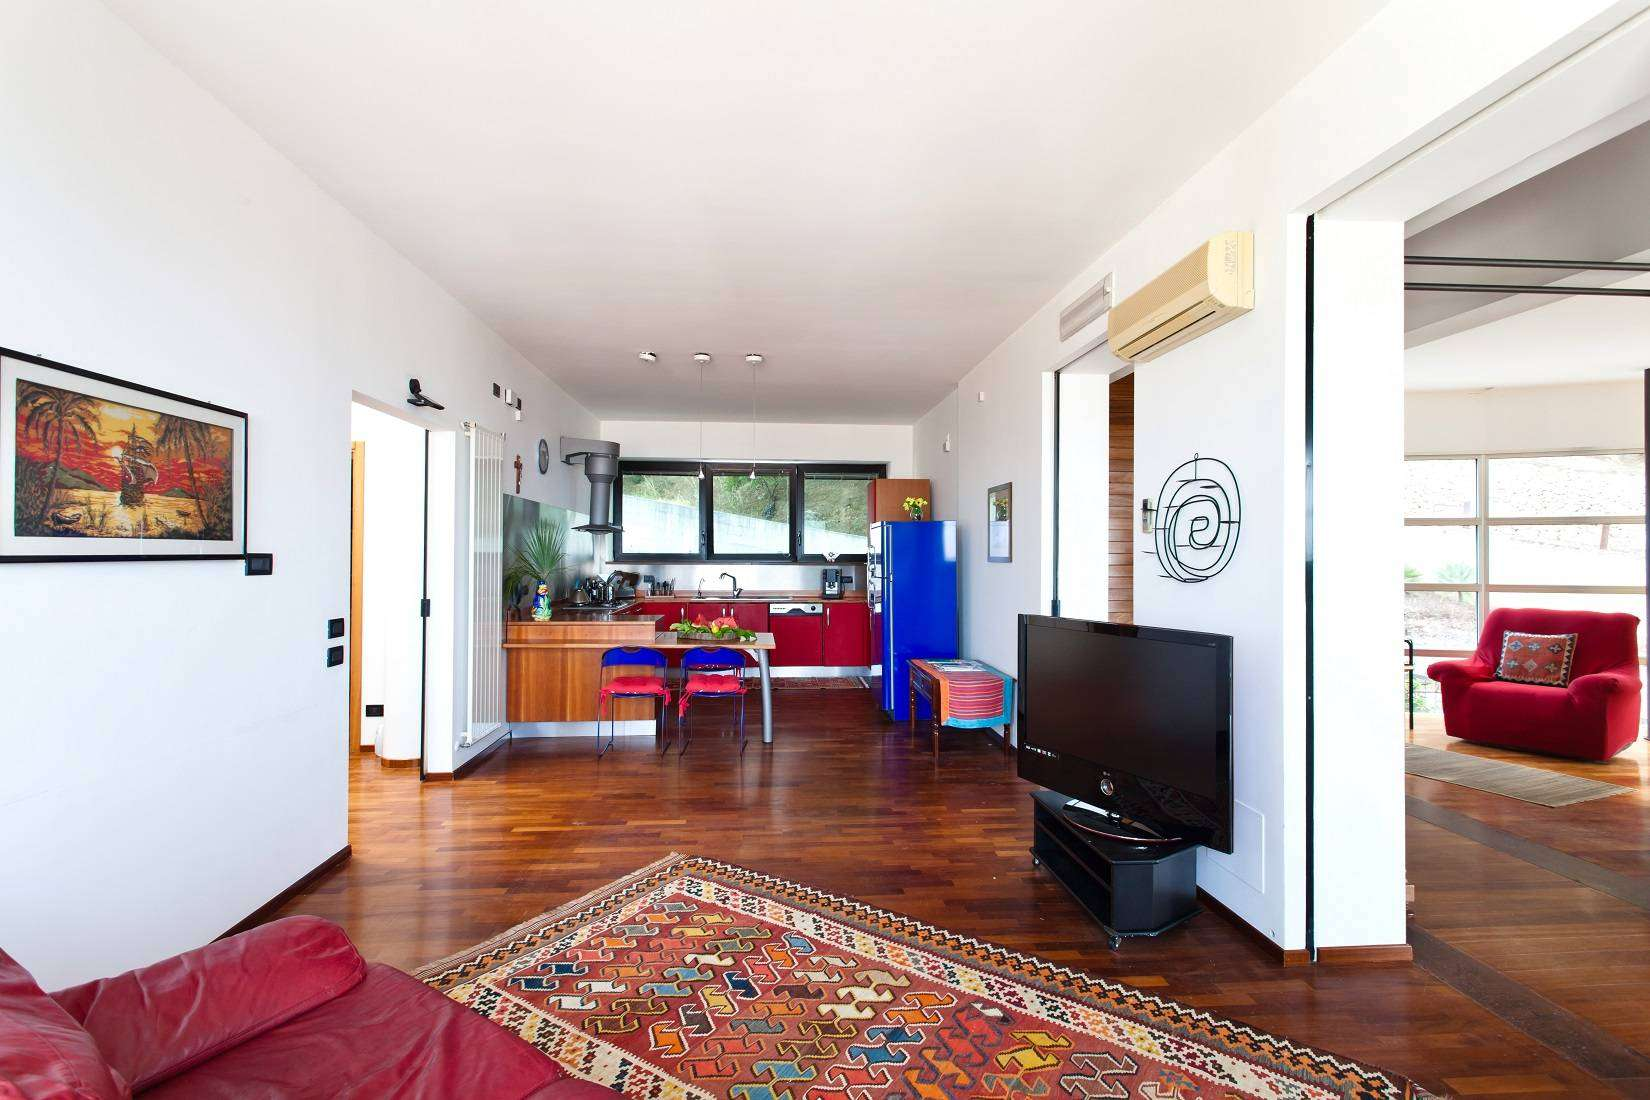 8 Infinity Kitchen-Living room